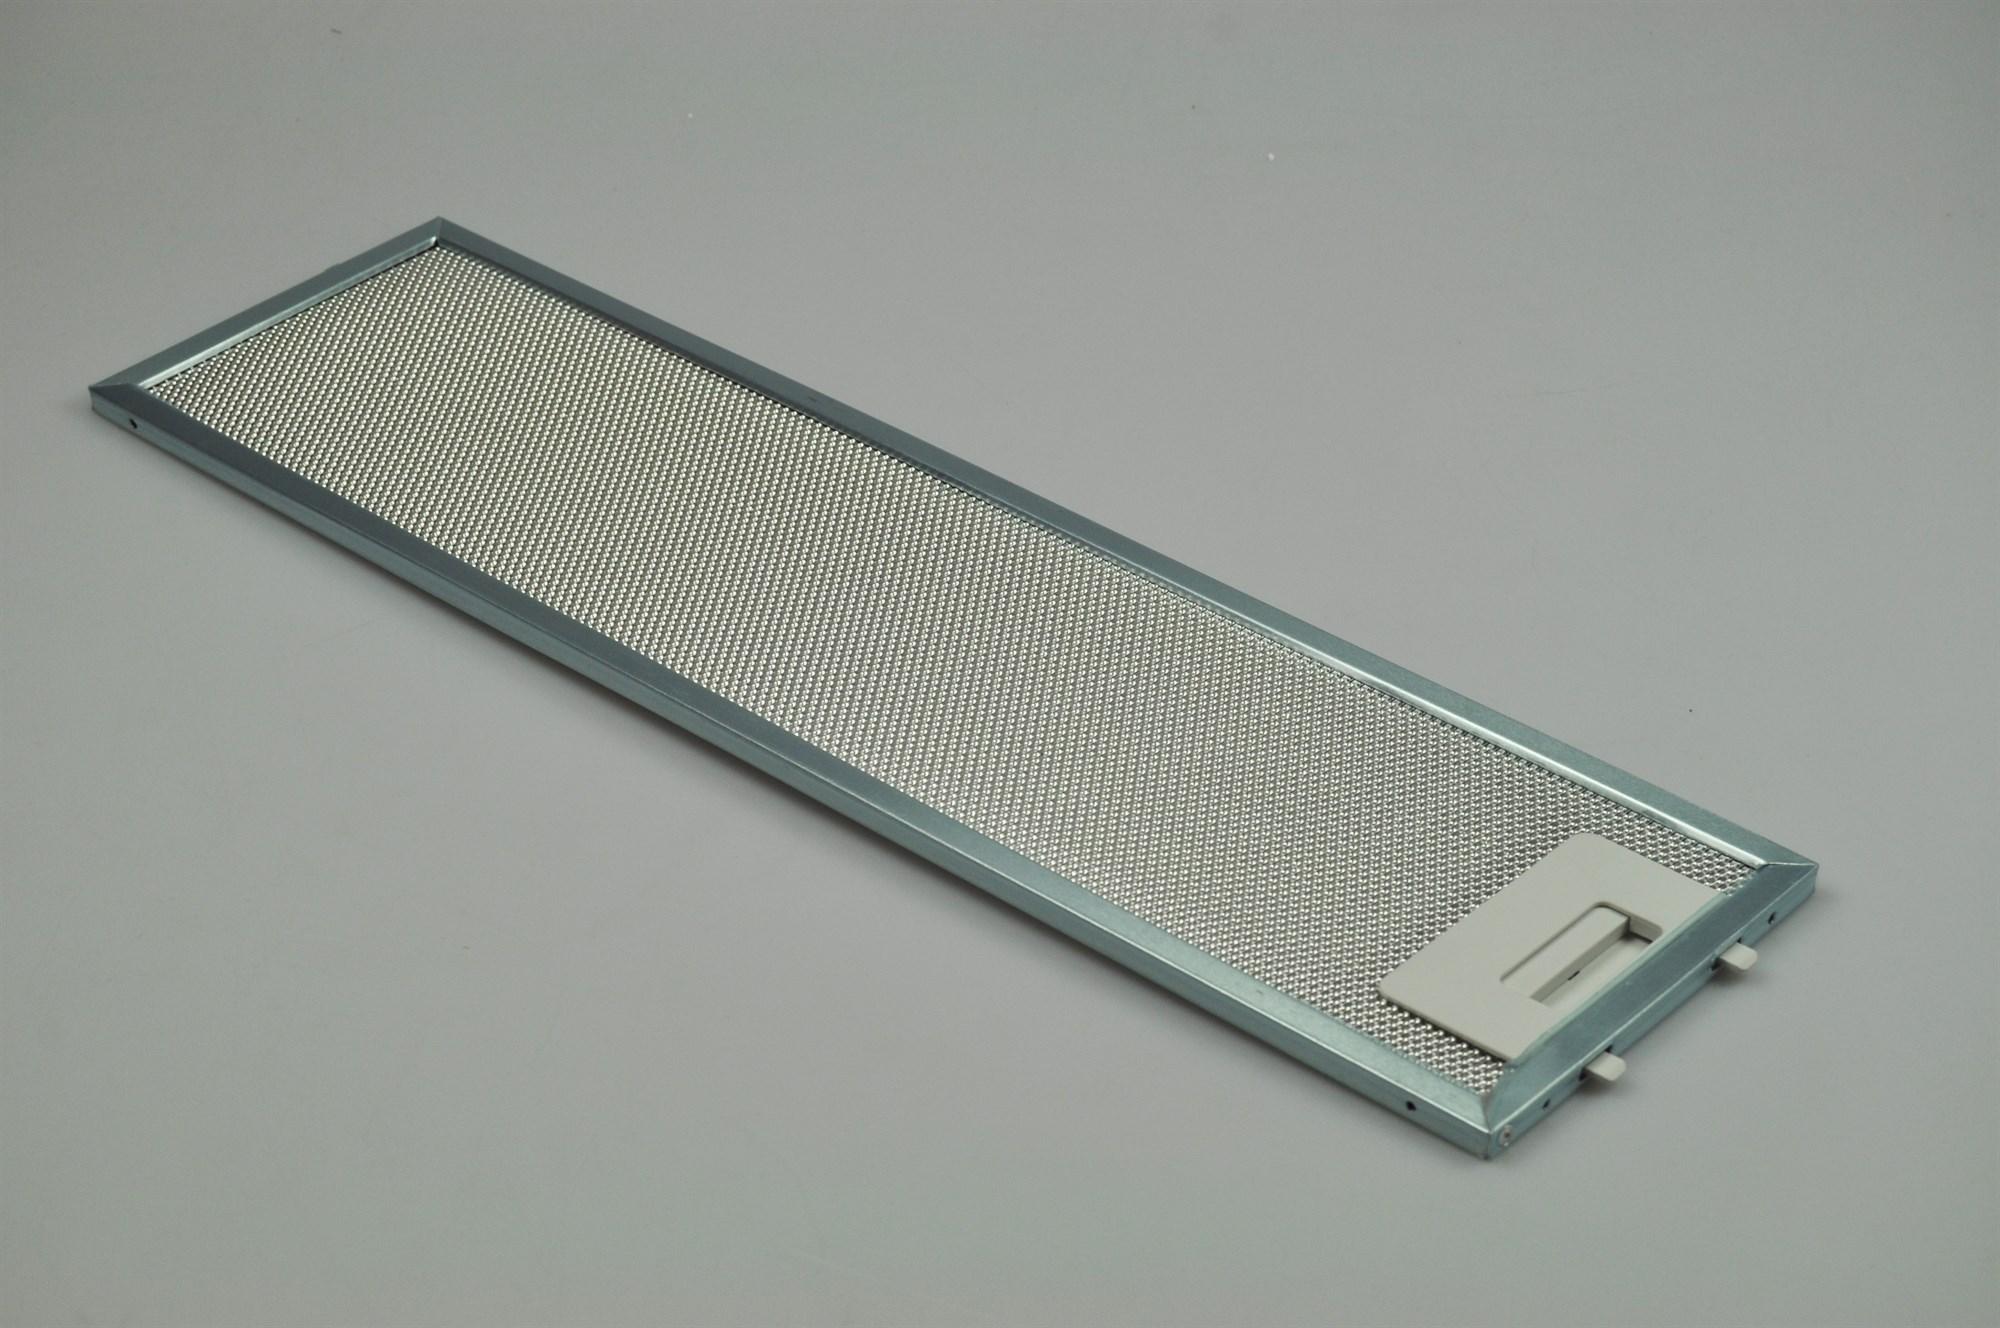 metallfilter silverline dunstabzugshaube 8 mm x 475 mm x 130 mm. Black Bedroom Furniture Sets. Home Design Ideas